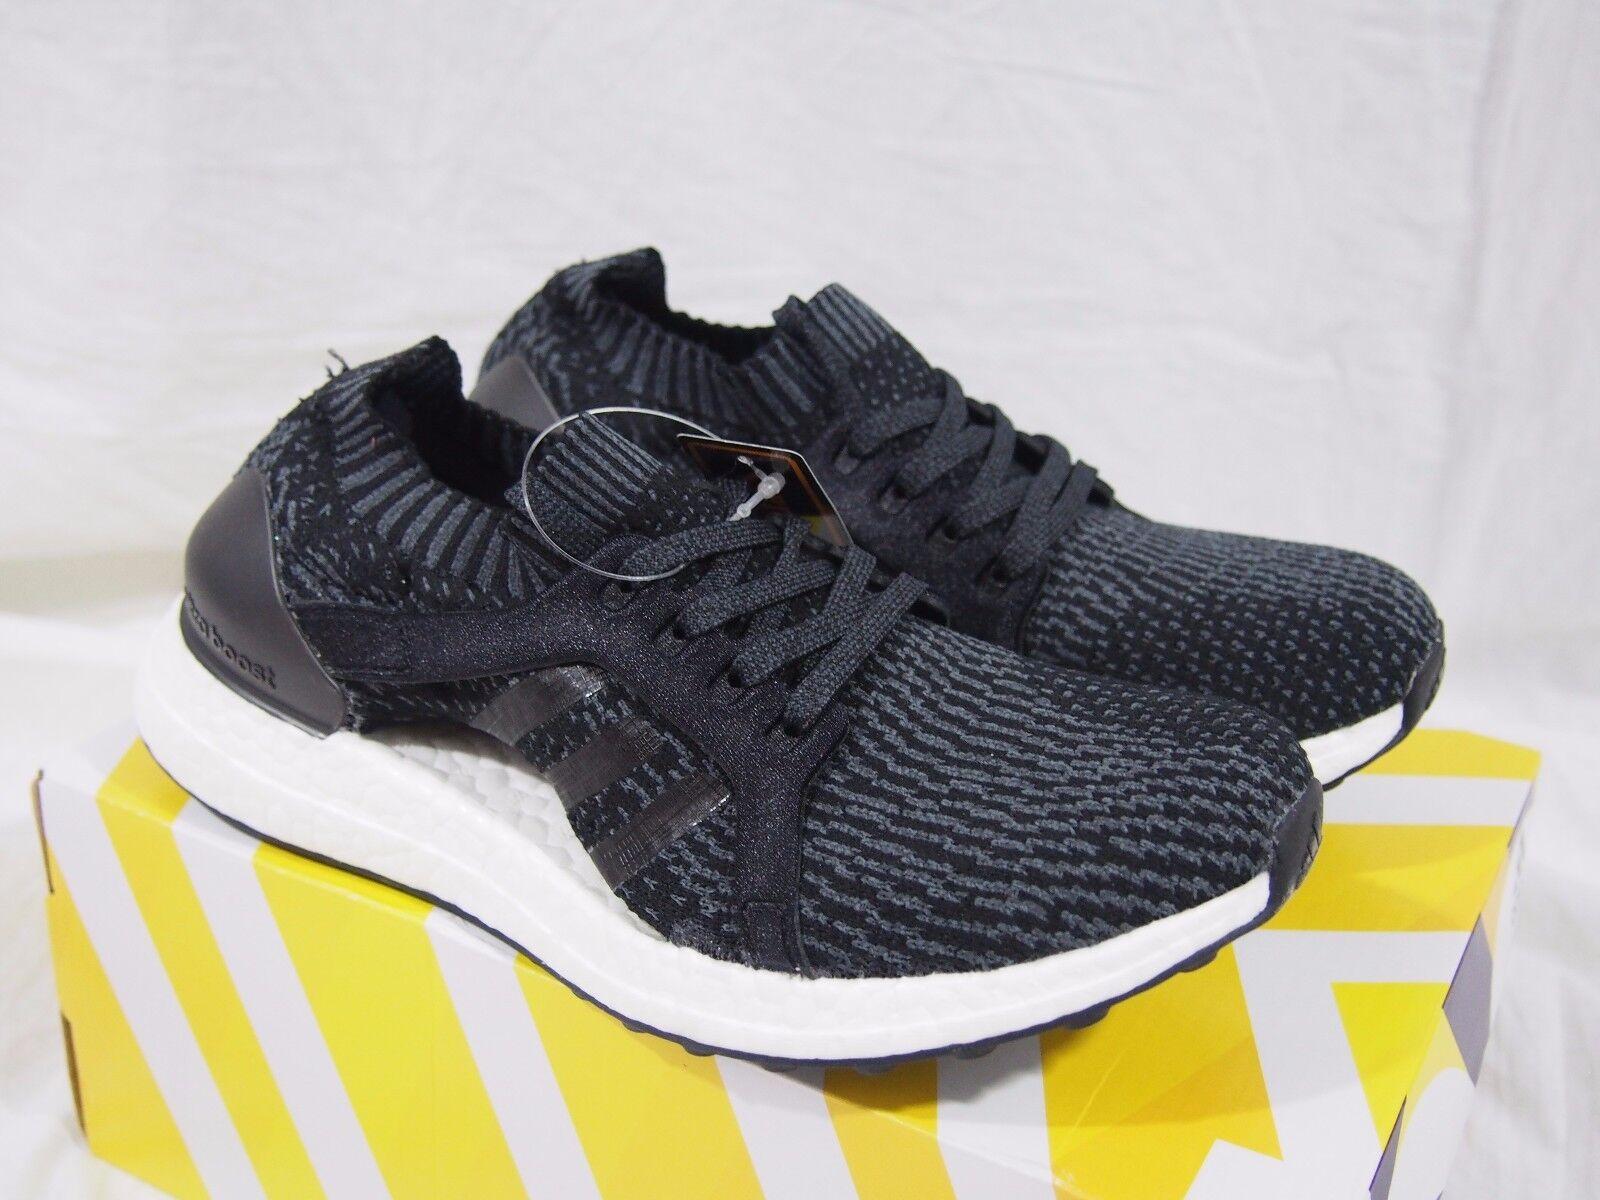 Adidas UltraBoost X Women's size 5.5 Core Black BB1696